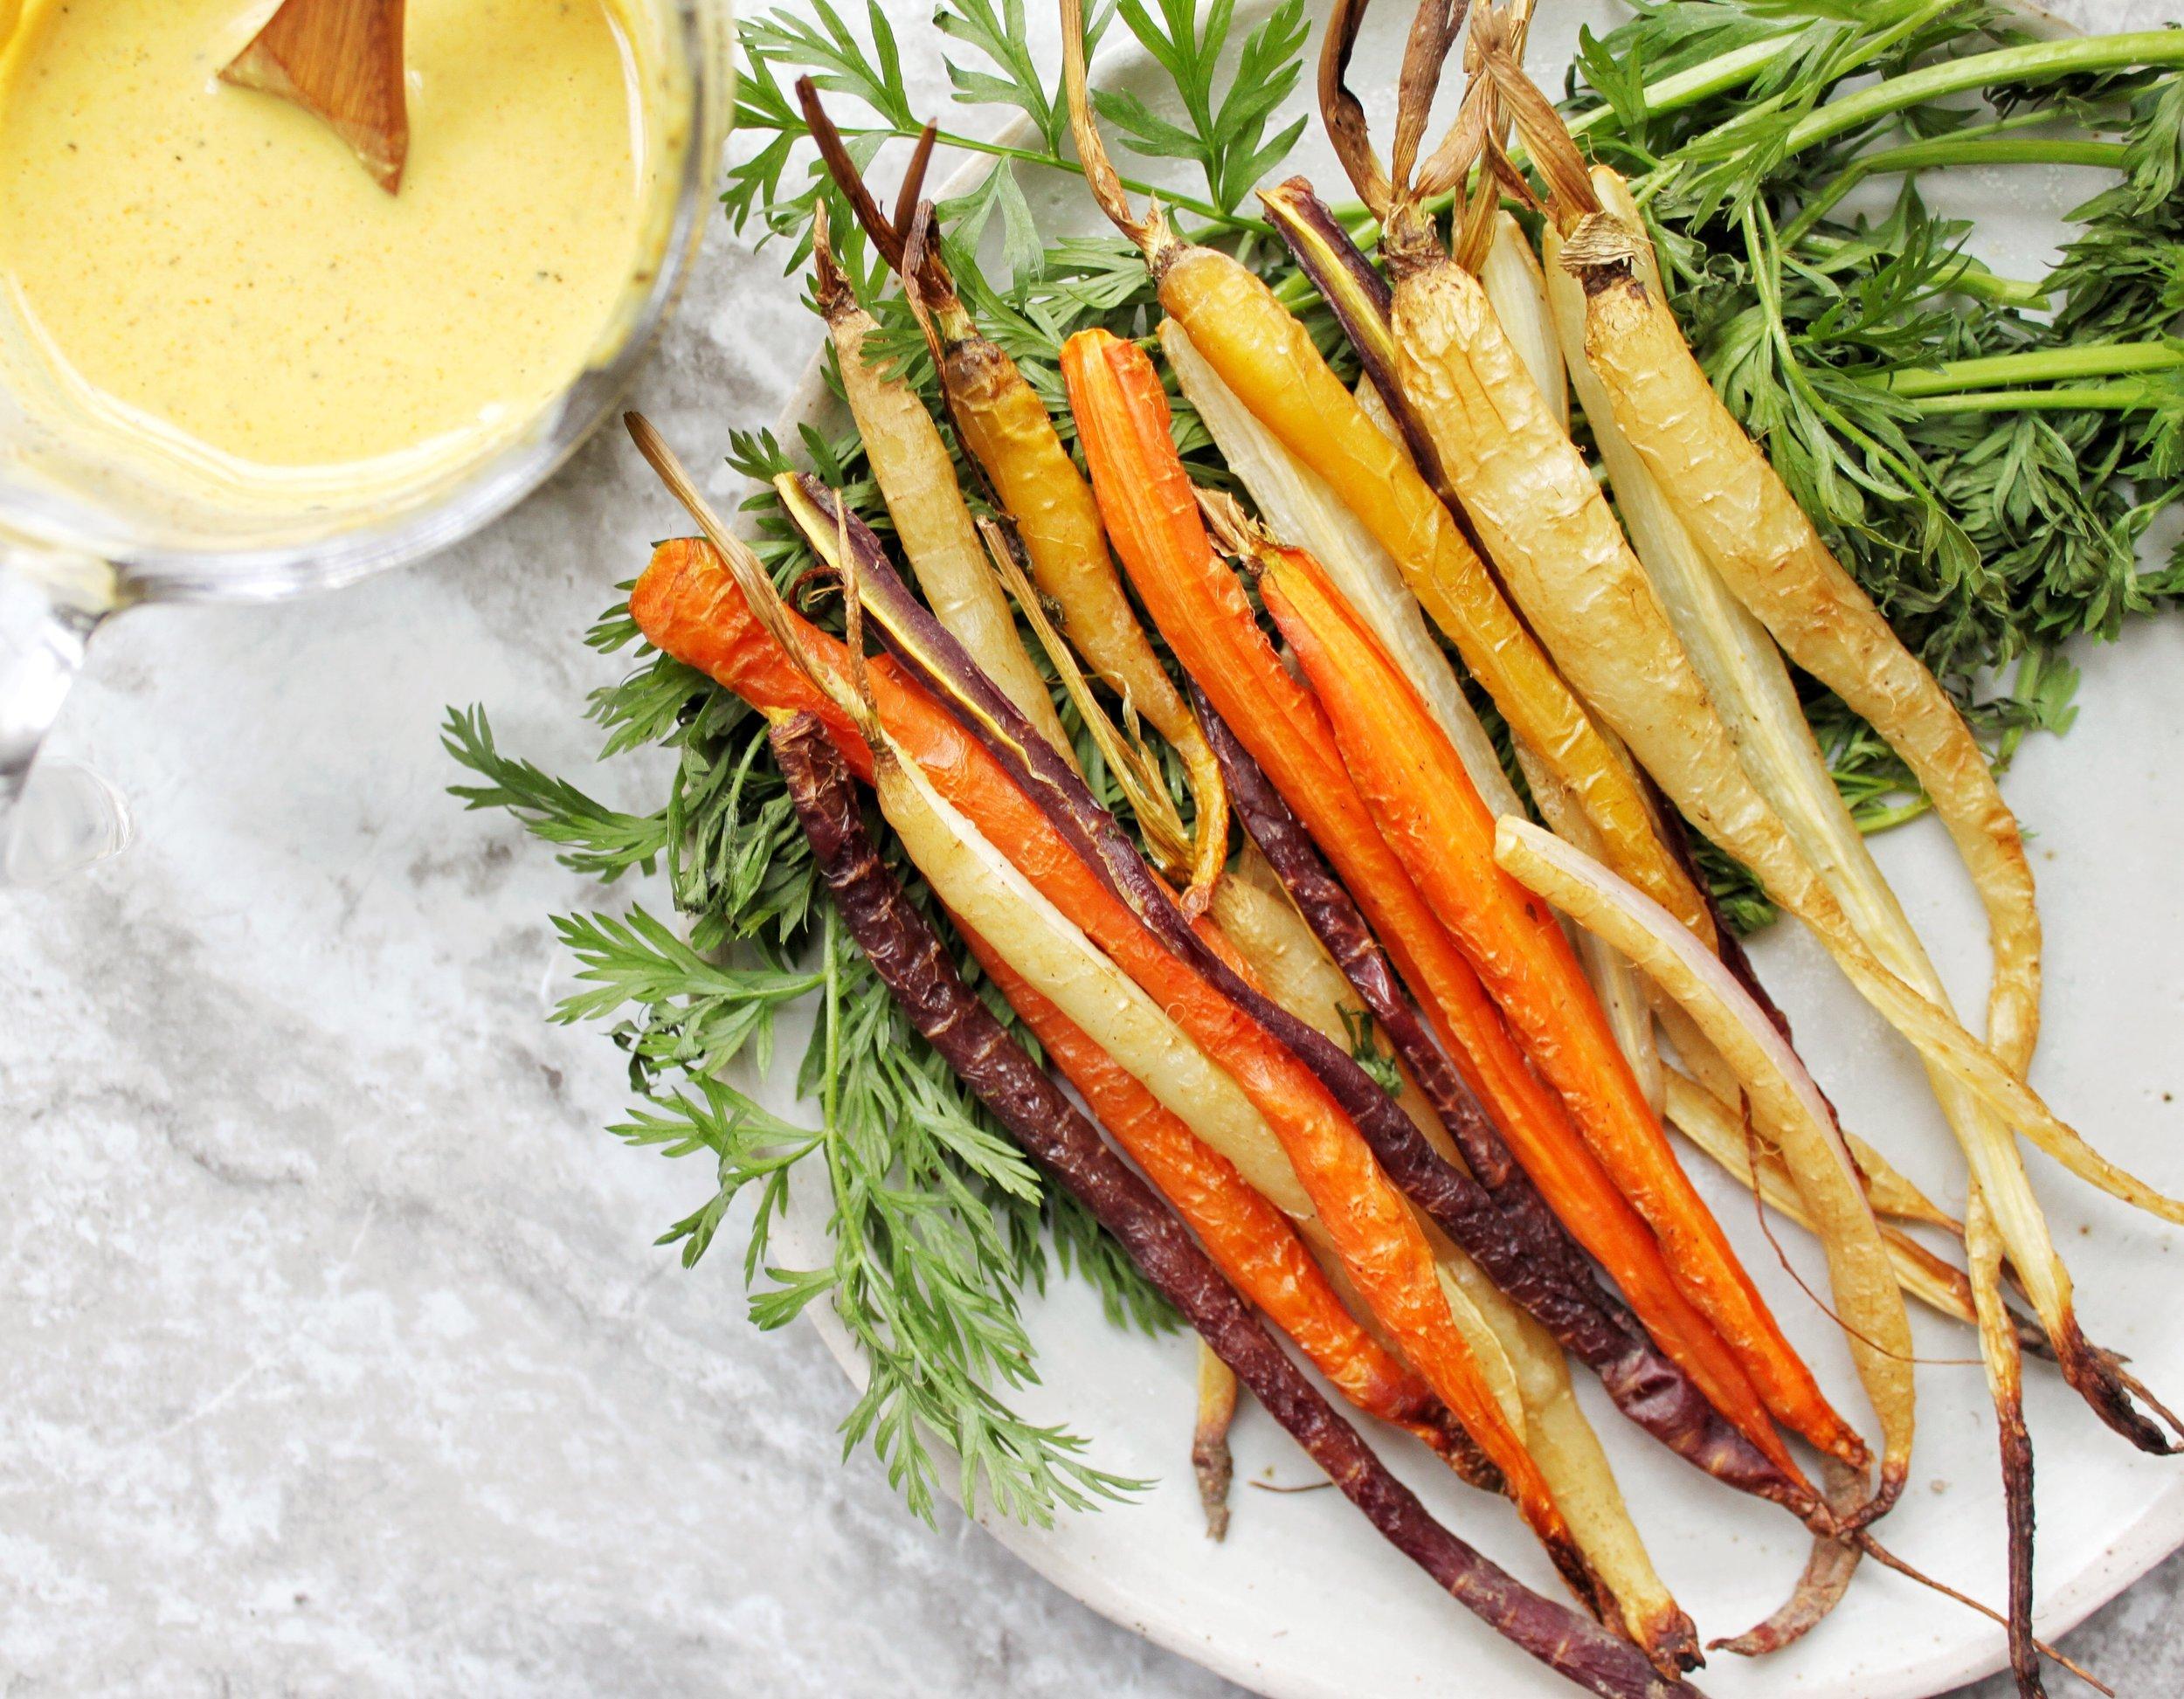 carrotsedit2.jpg